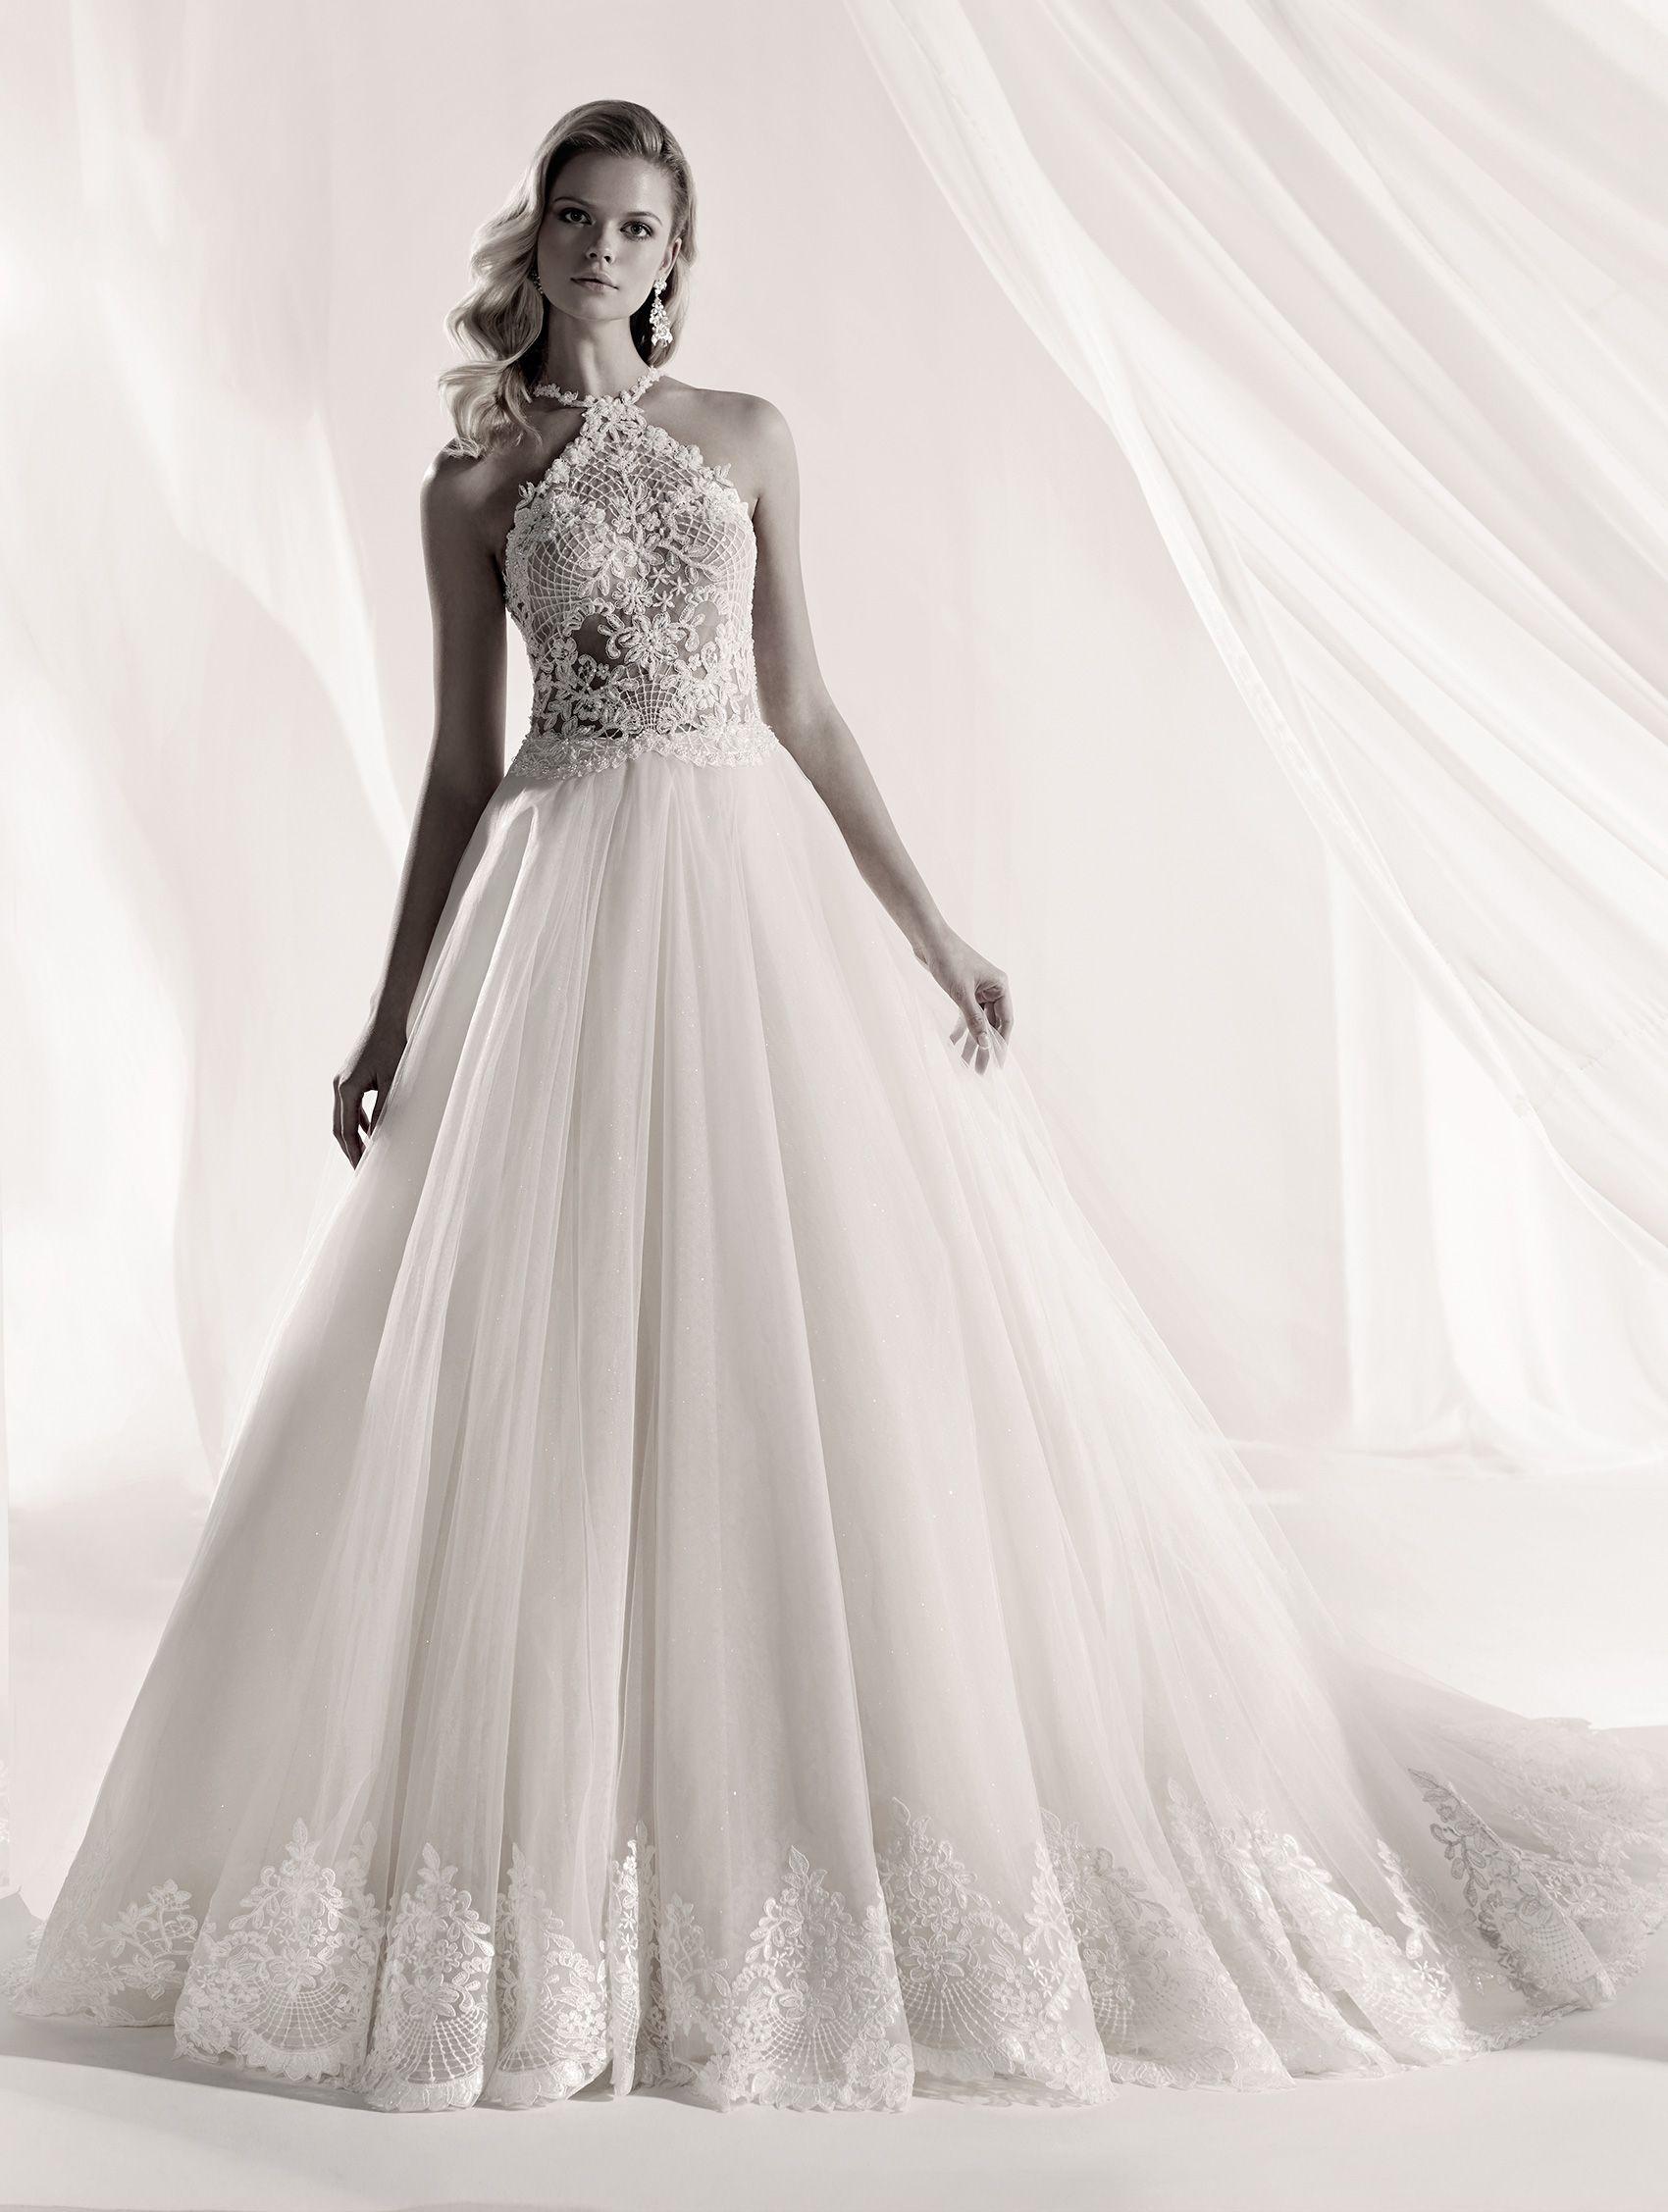 Lxab nicole luxury collection beautiful princely